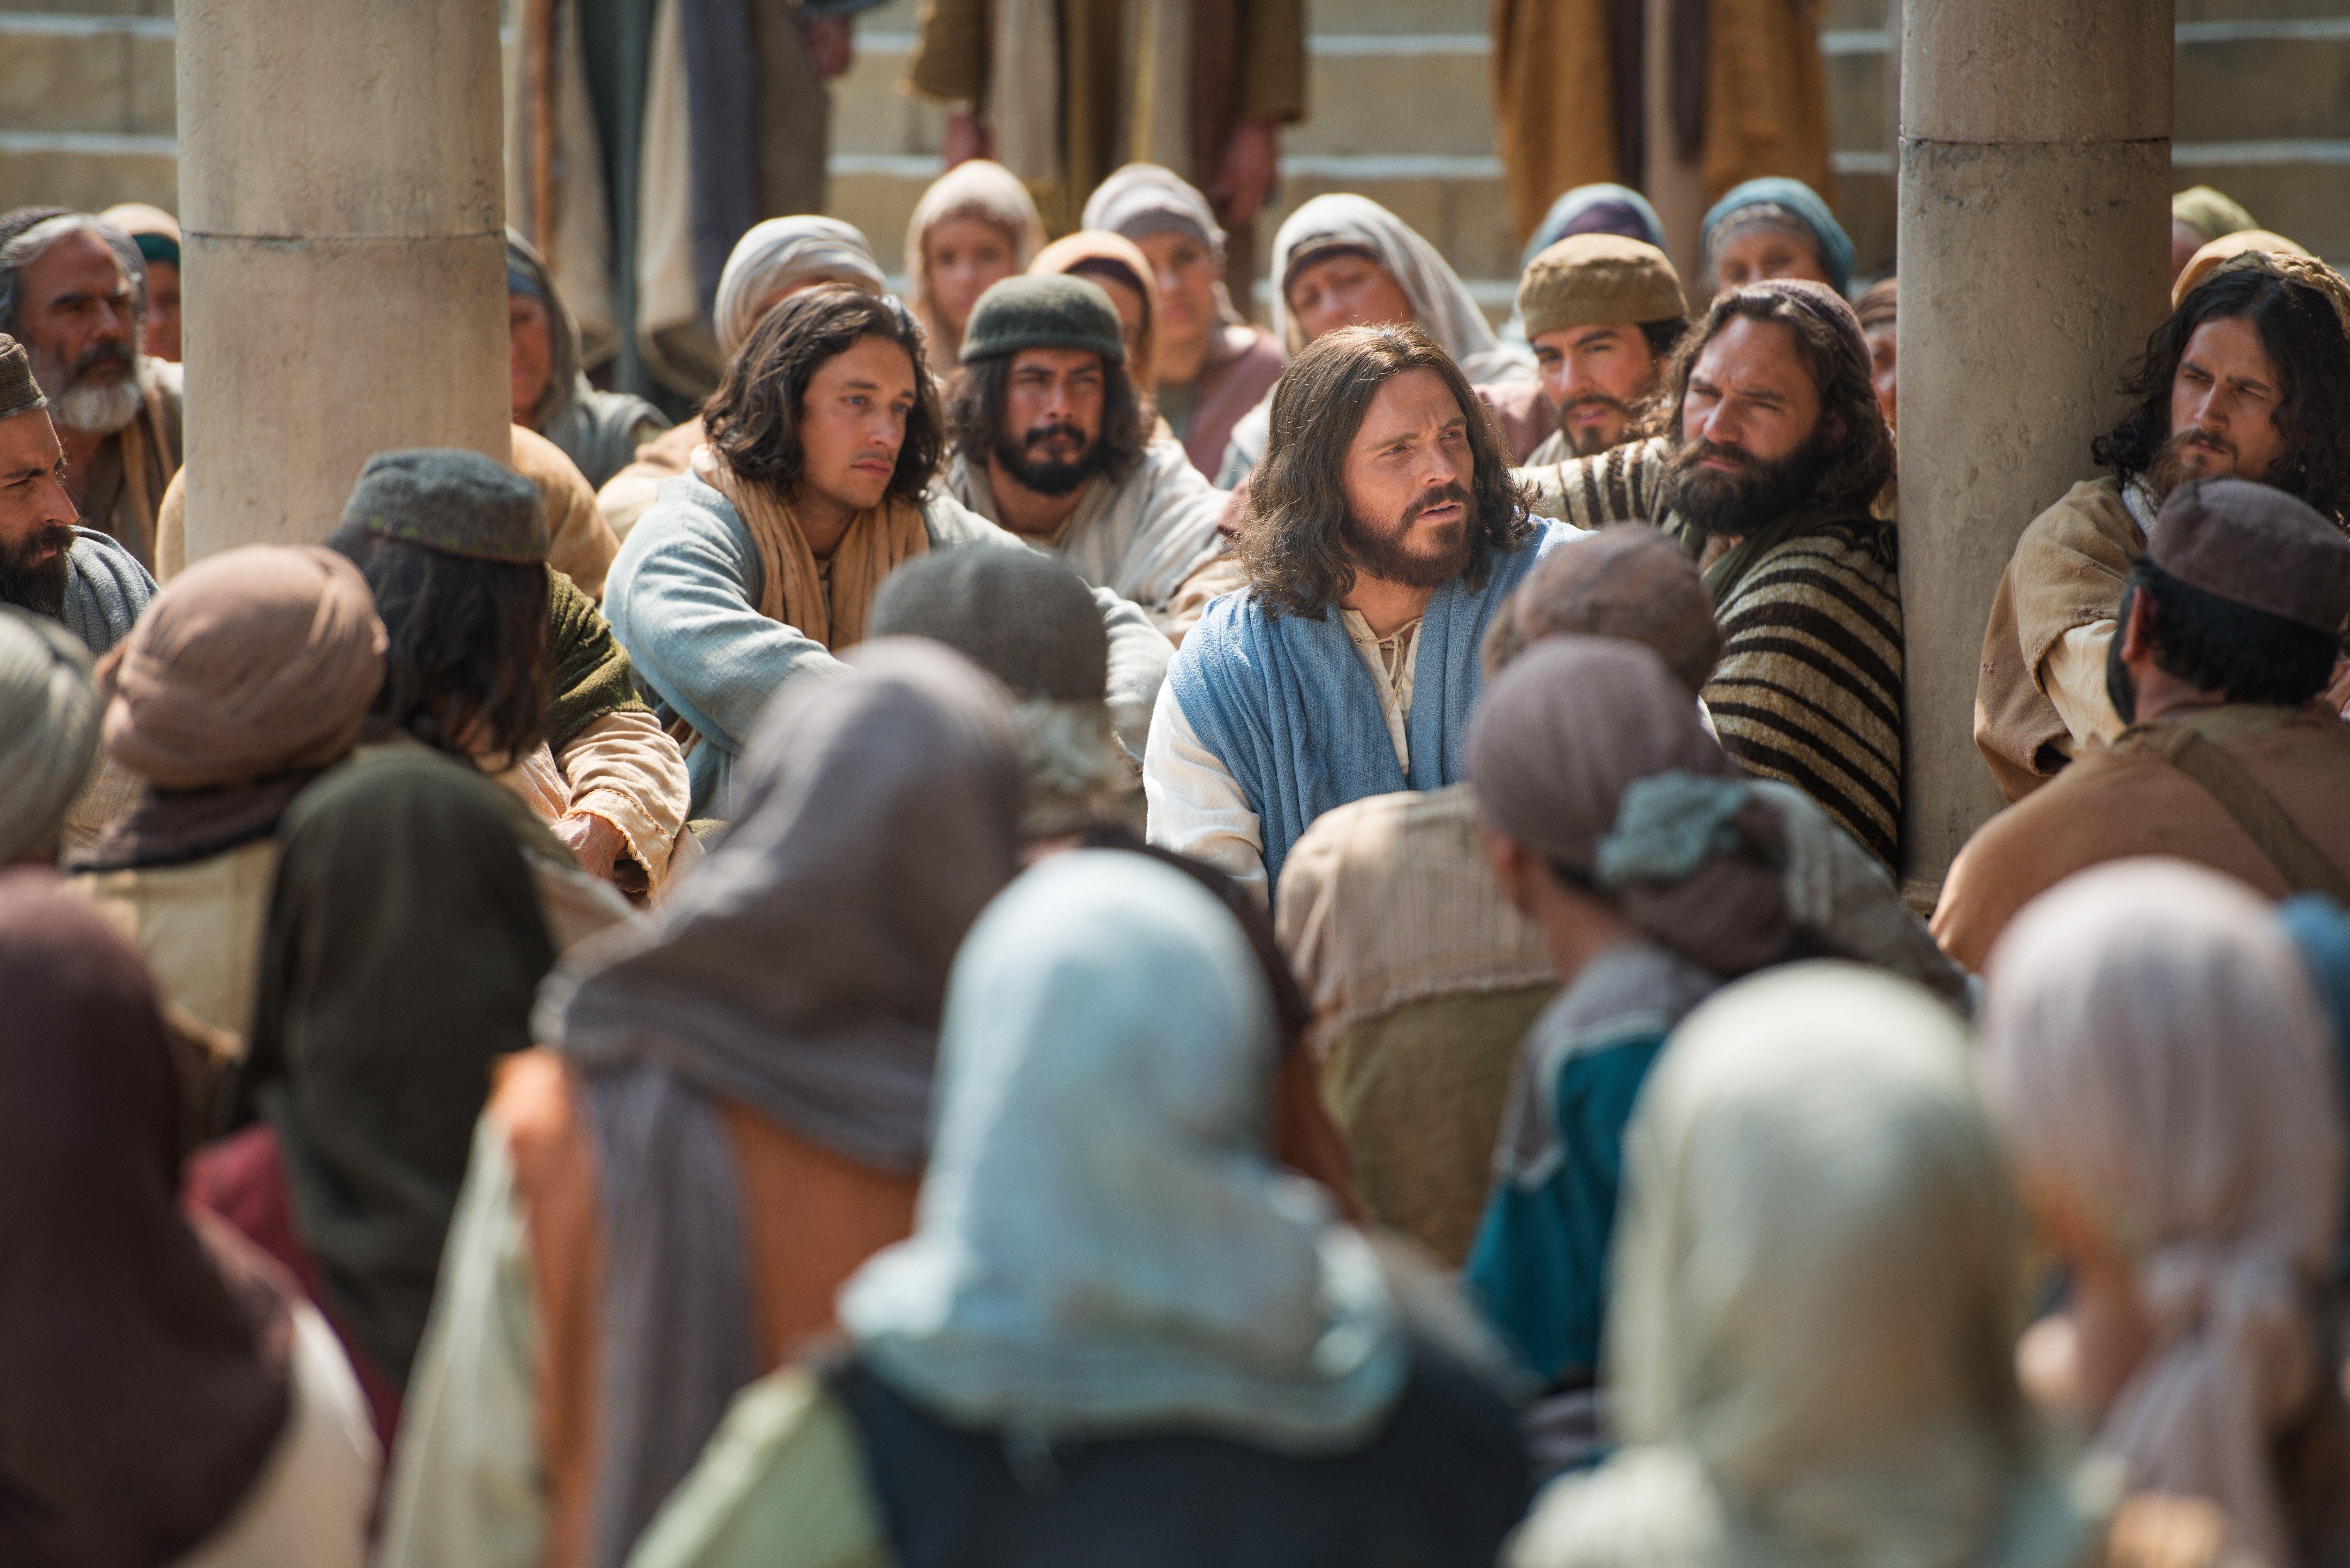 Jesus teaches about the greatest commandment.